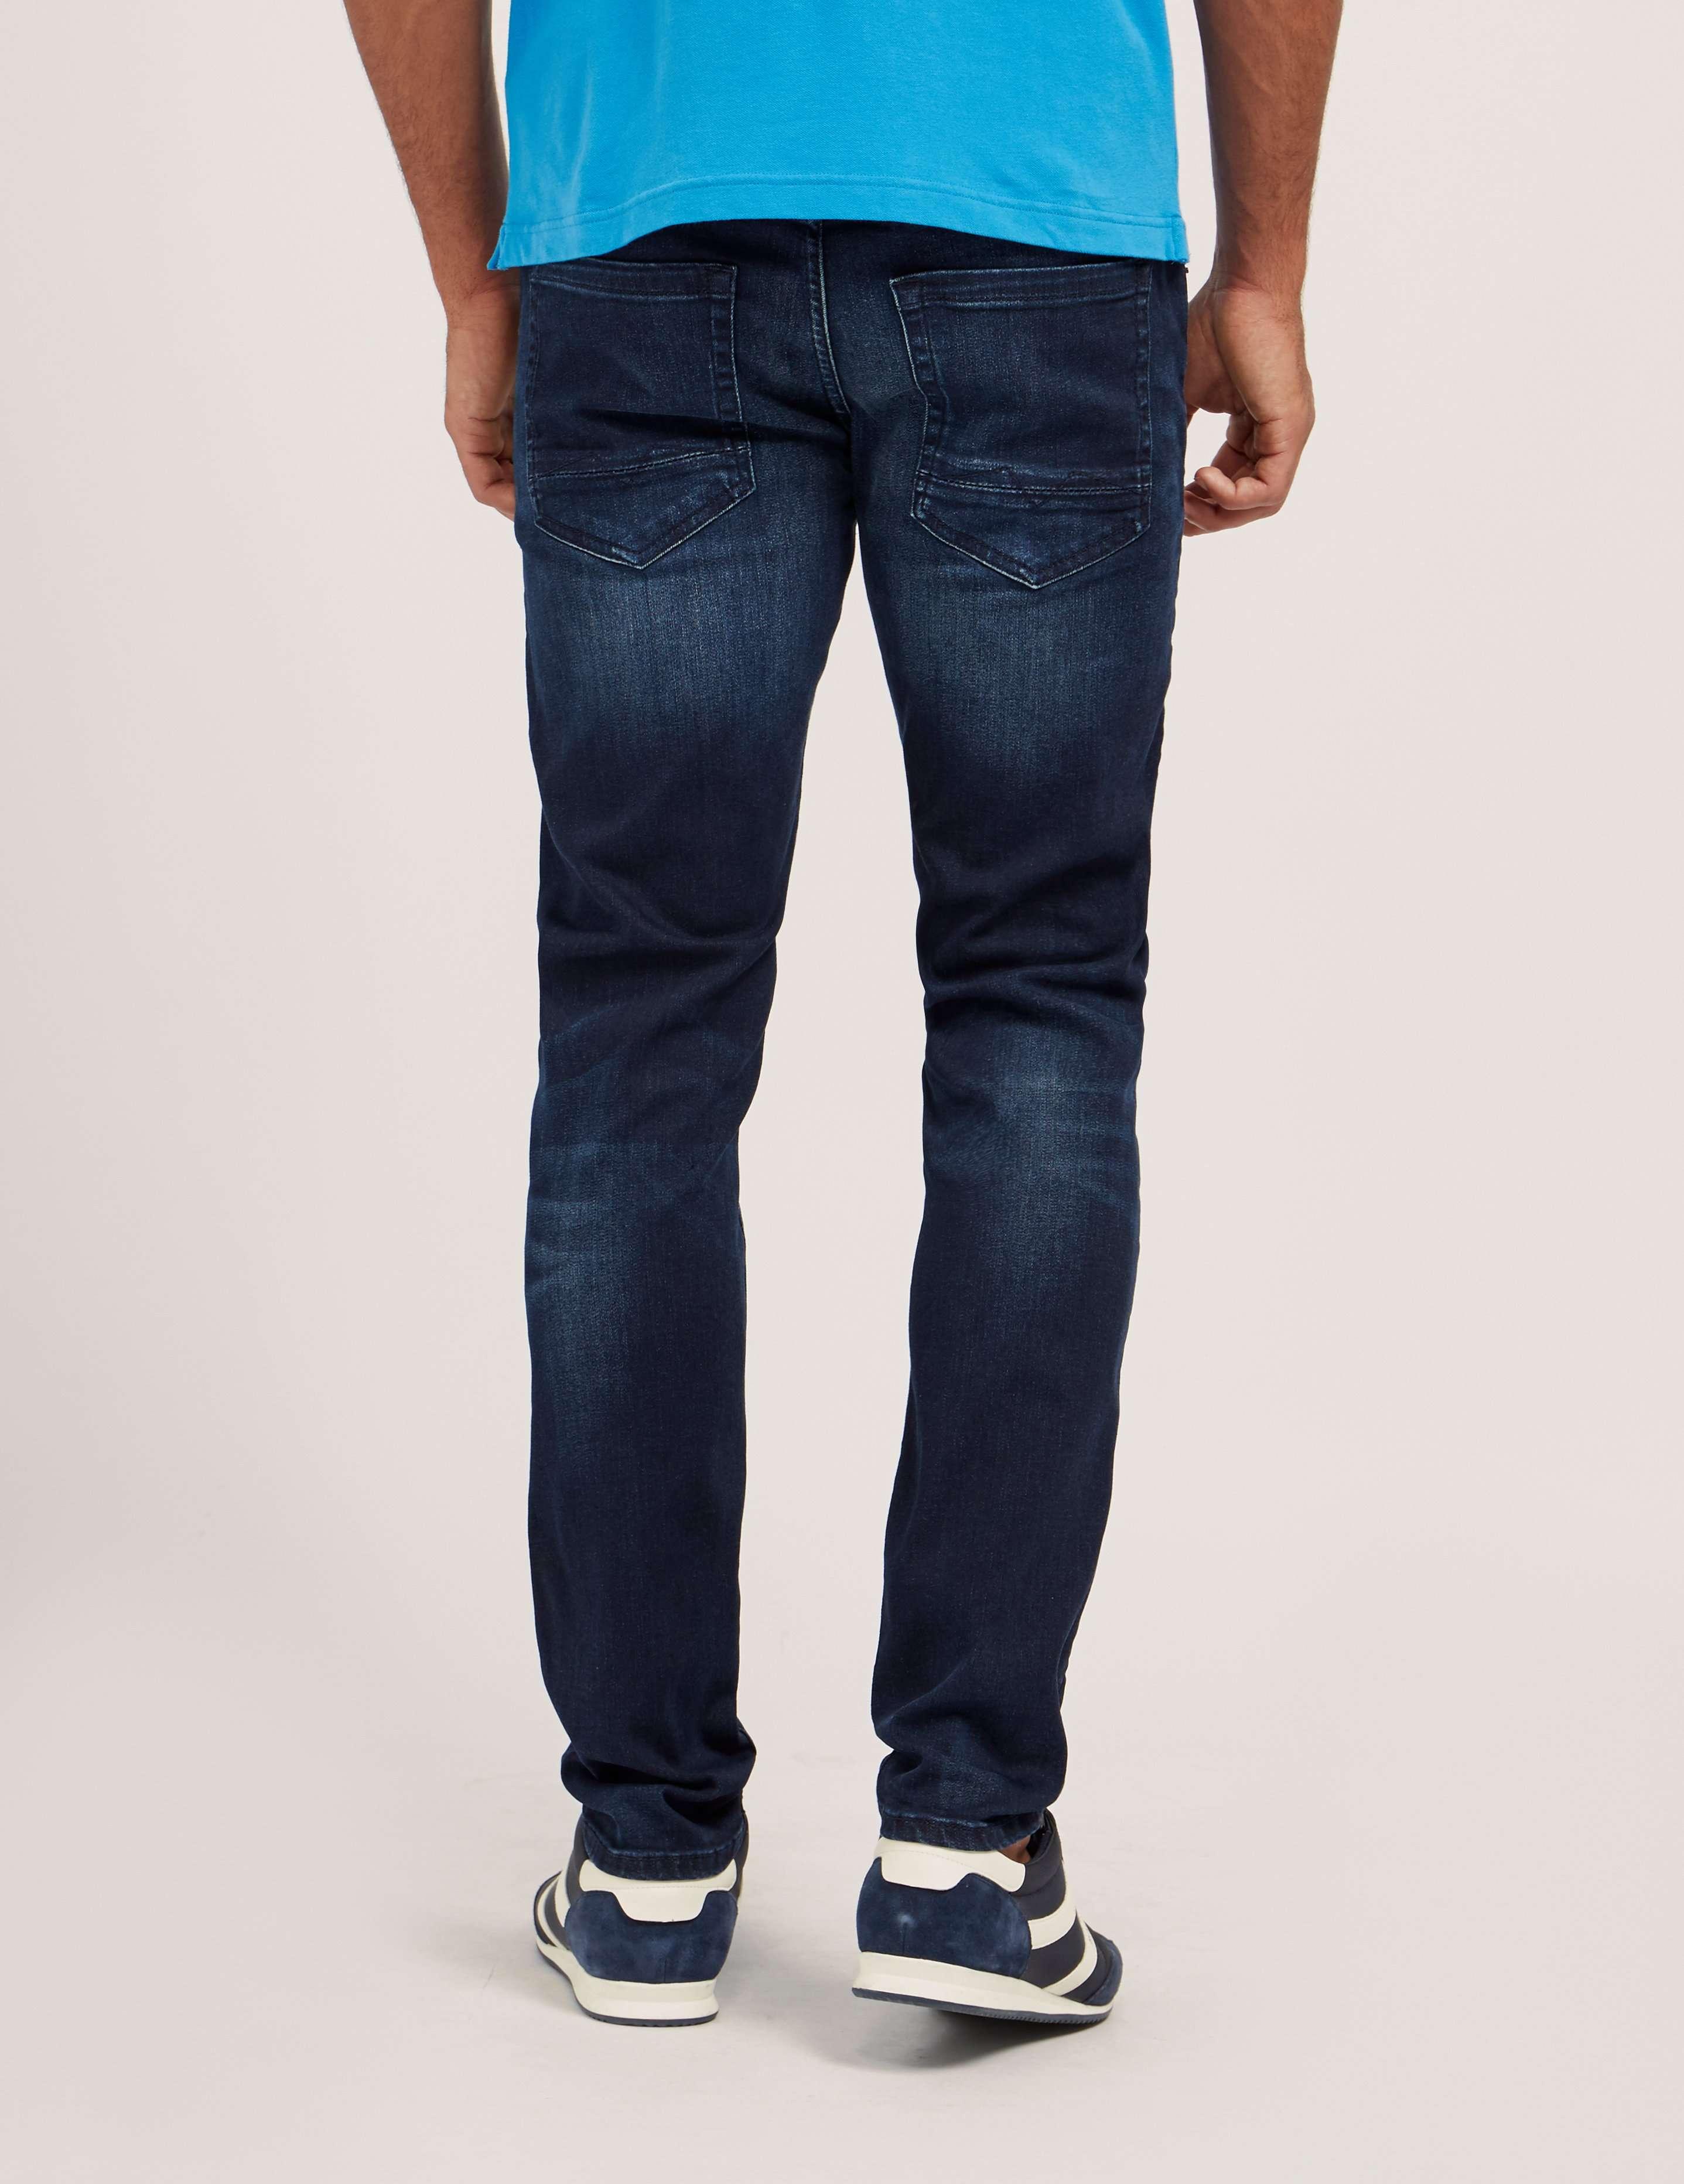 BOSS Orange 72 Skinny Stretch Jeans